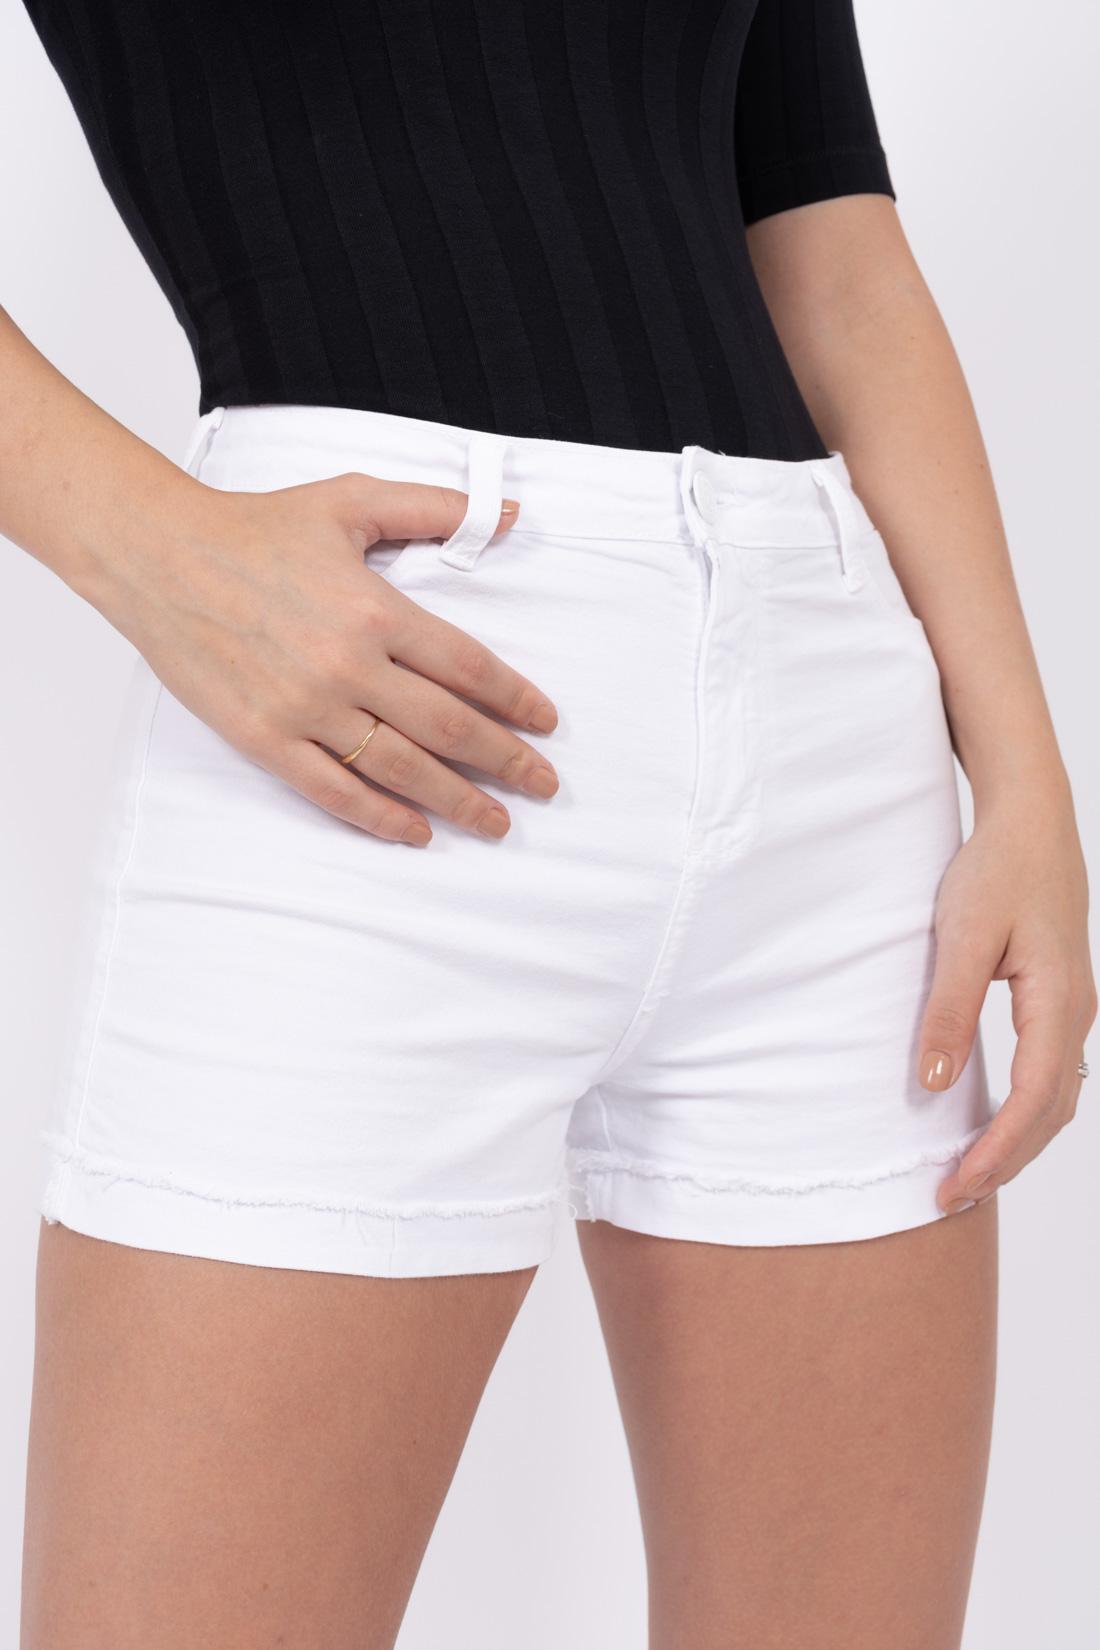 Shorts Sarja Hering Barra Dobrada